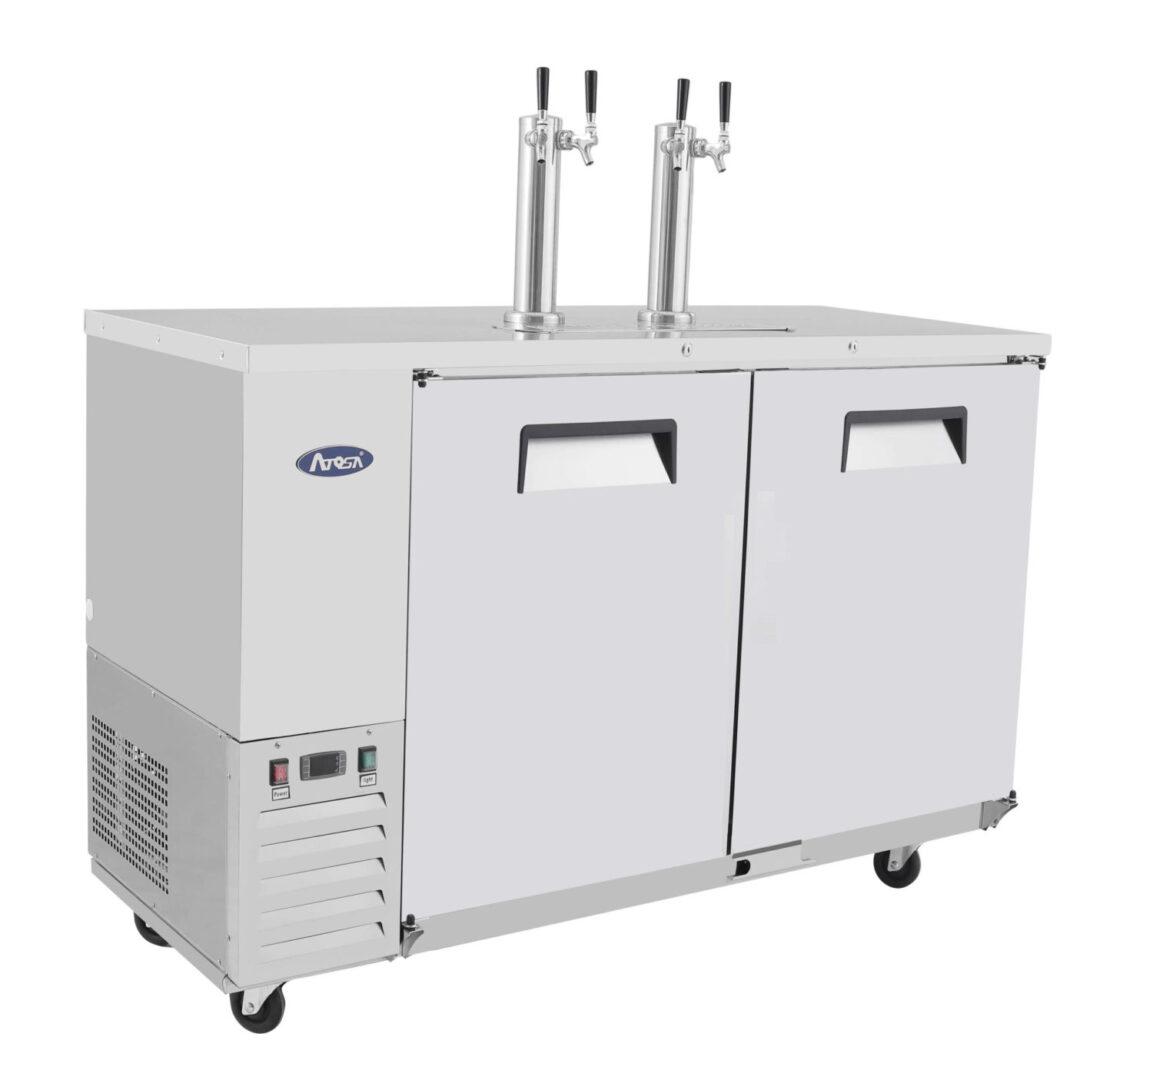 Atosa MKC58 Keg Coolers